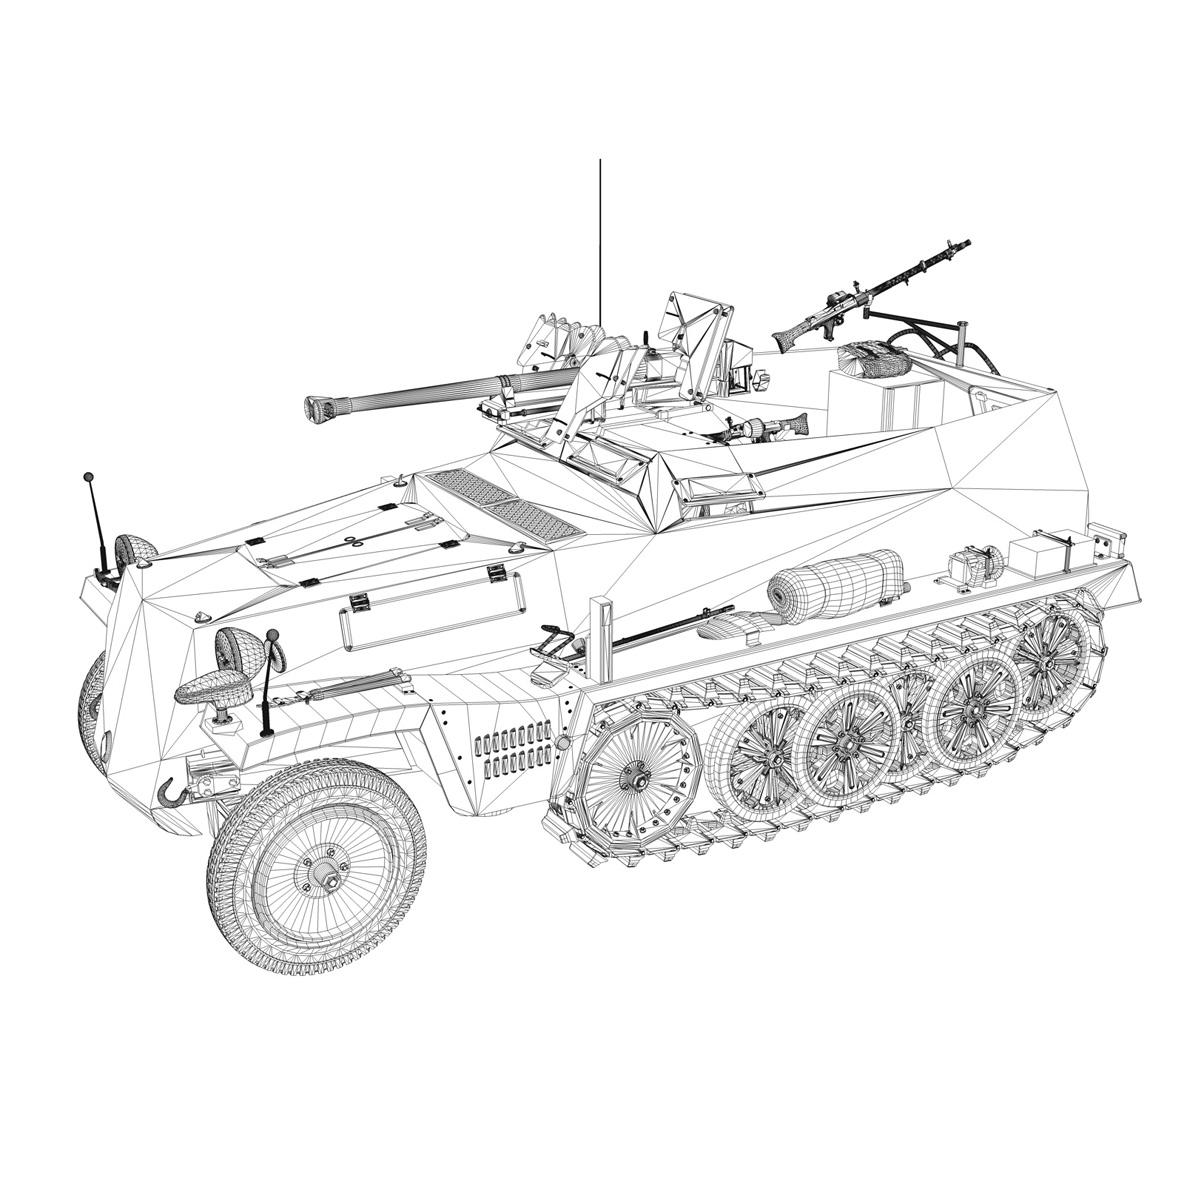 sd.kfz 250/11 – halftruck with spzb 41 – pzgrendiv 3d model 3ds fbx c4d lwo obj 197657